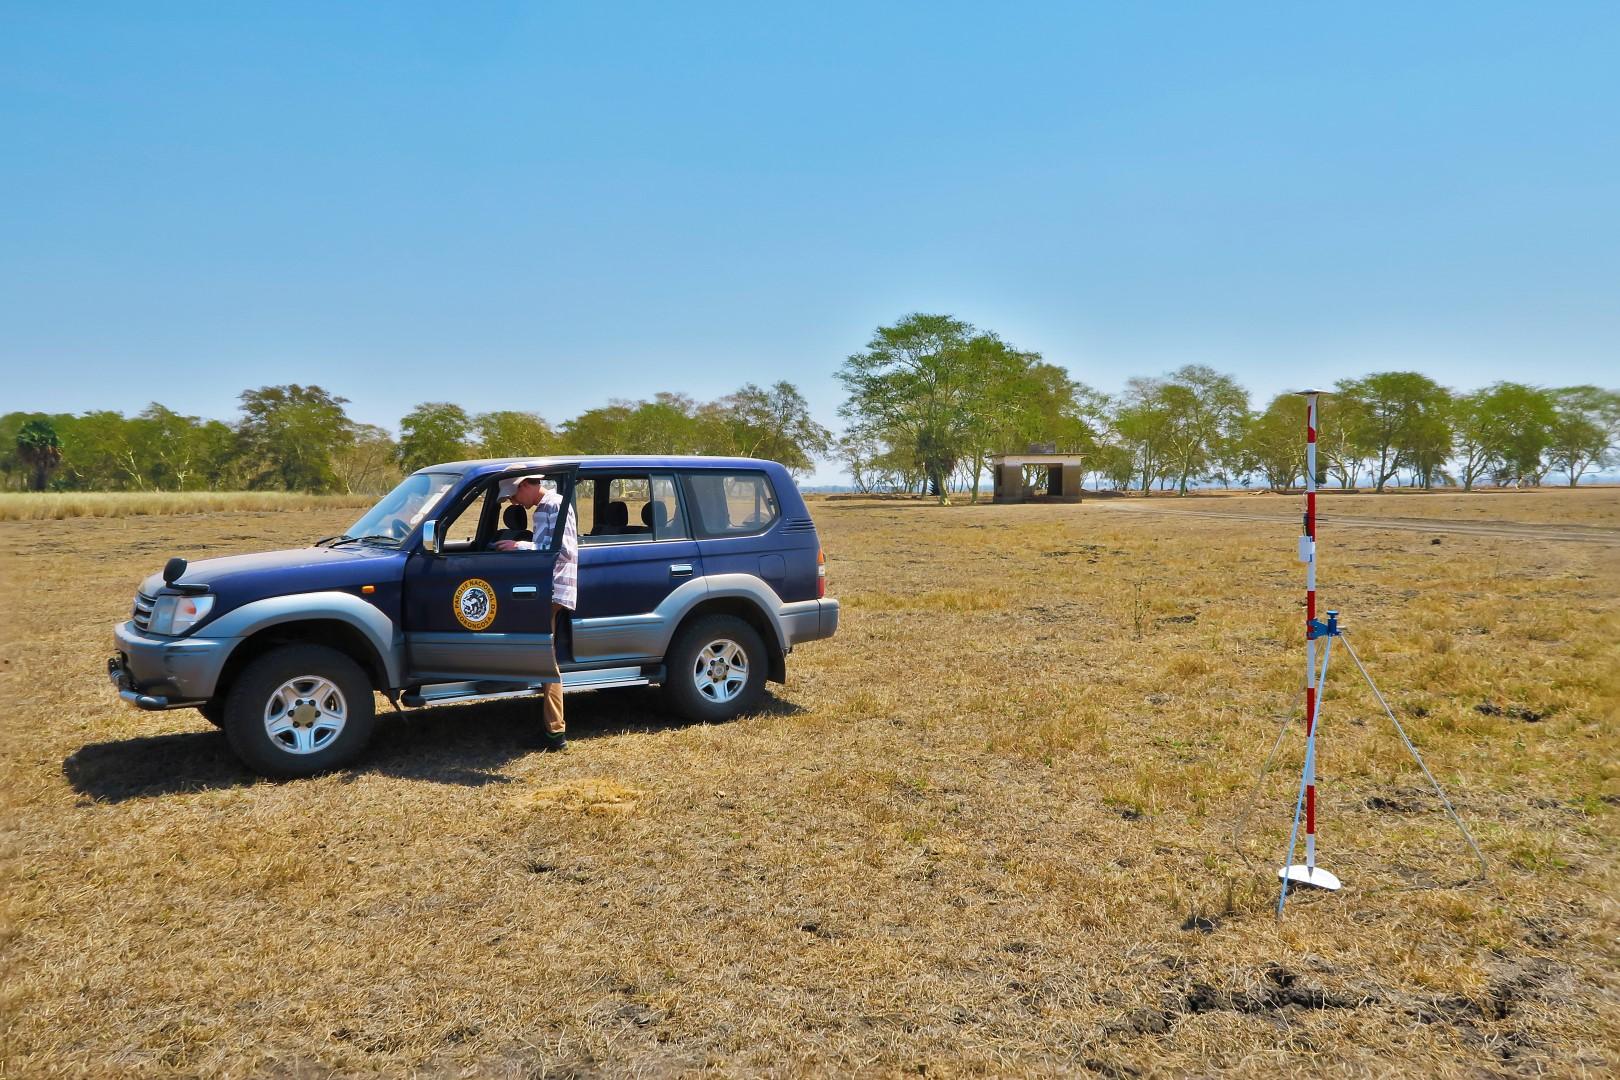 Static GPS measurements